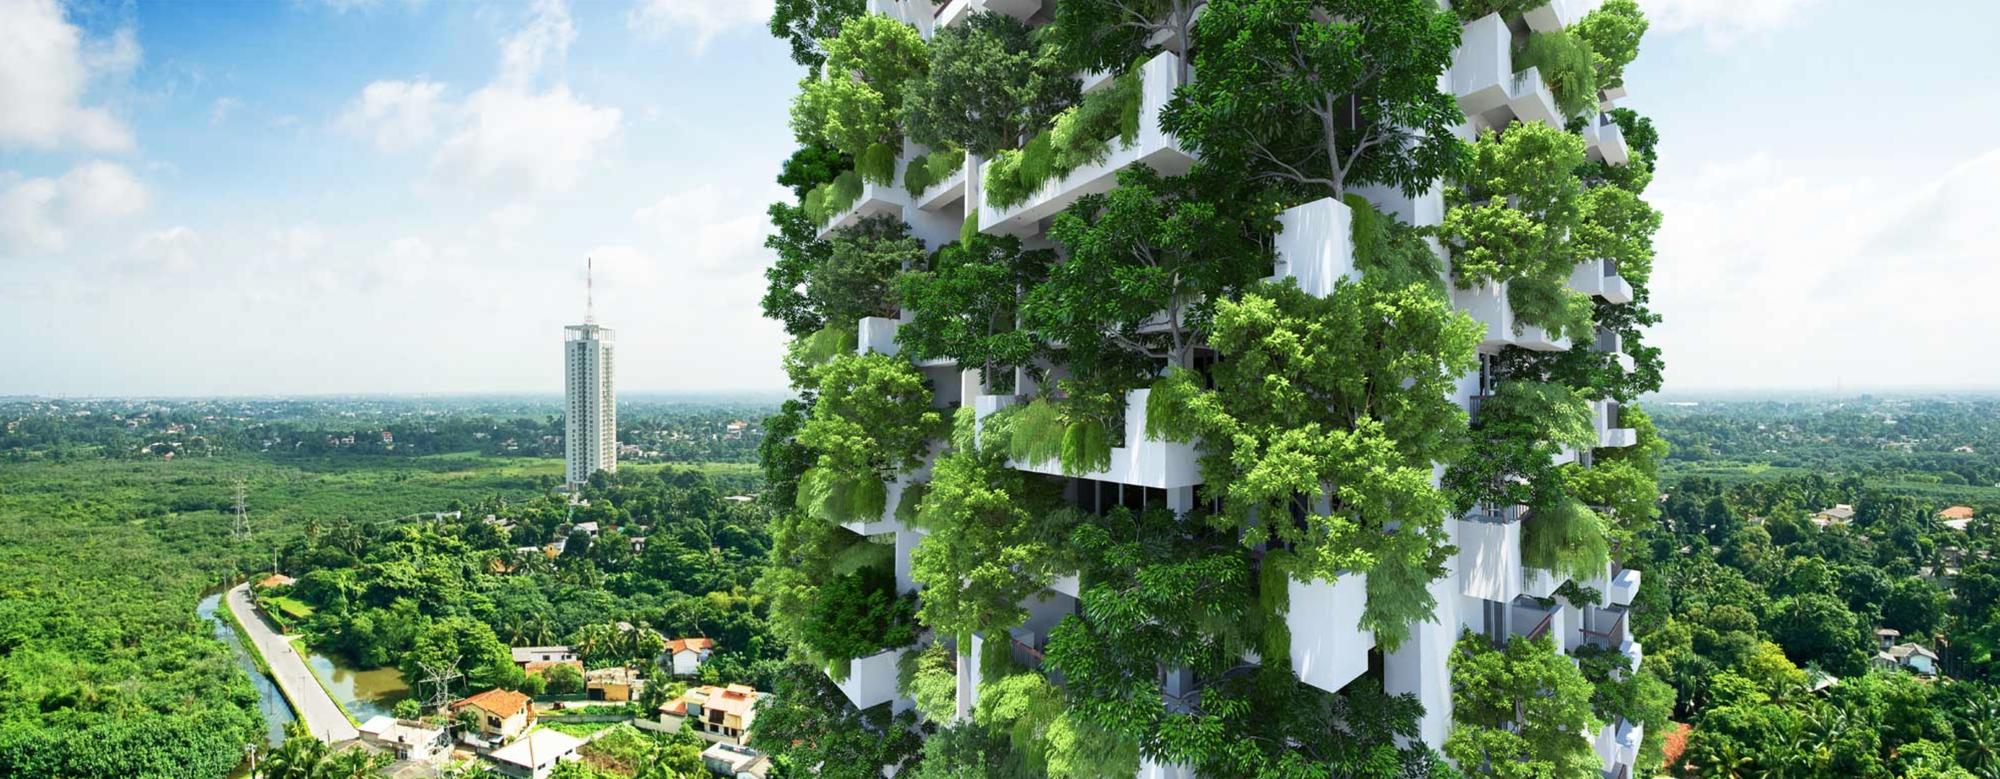 Milroy Perera Designs Worldu0027s Tallest Residential Vertical Garden,Courtesy  Of Clearpoint / Milroy Perera